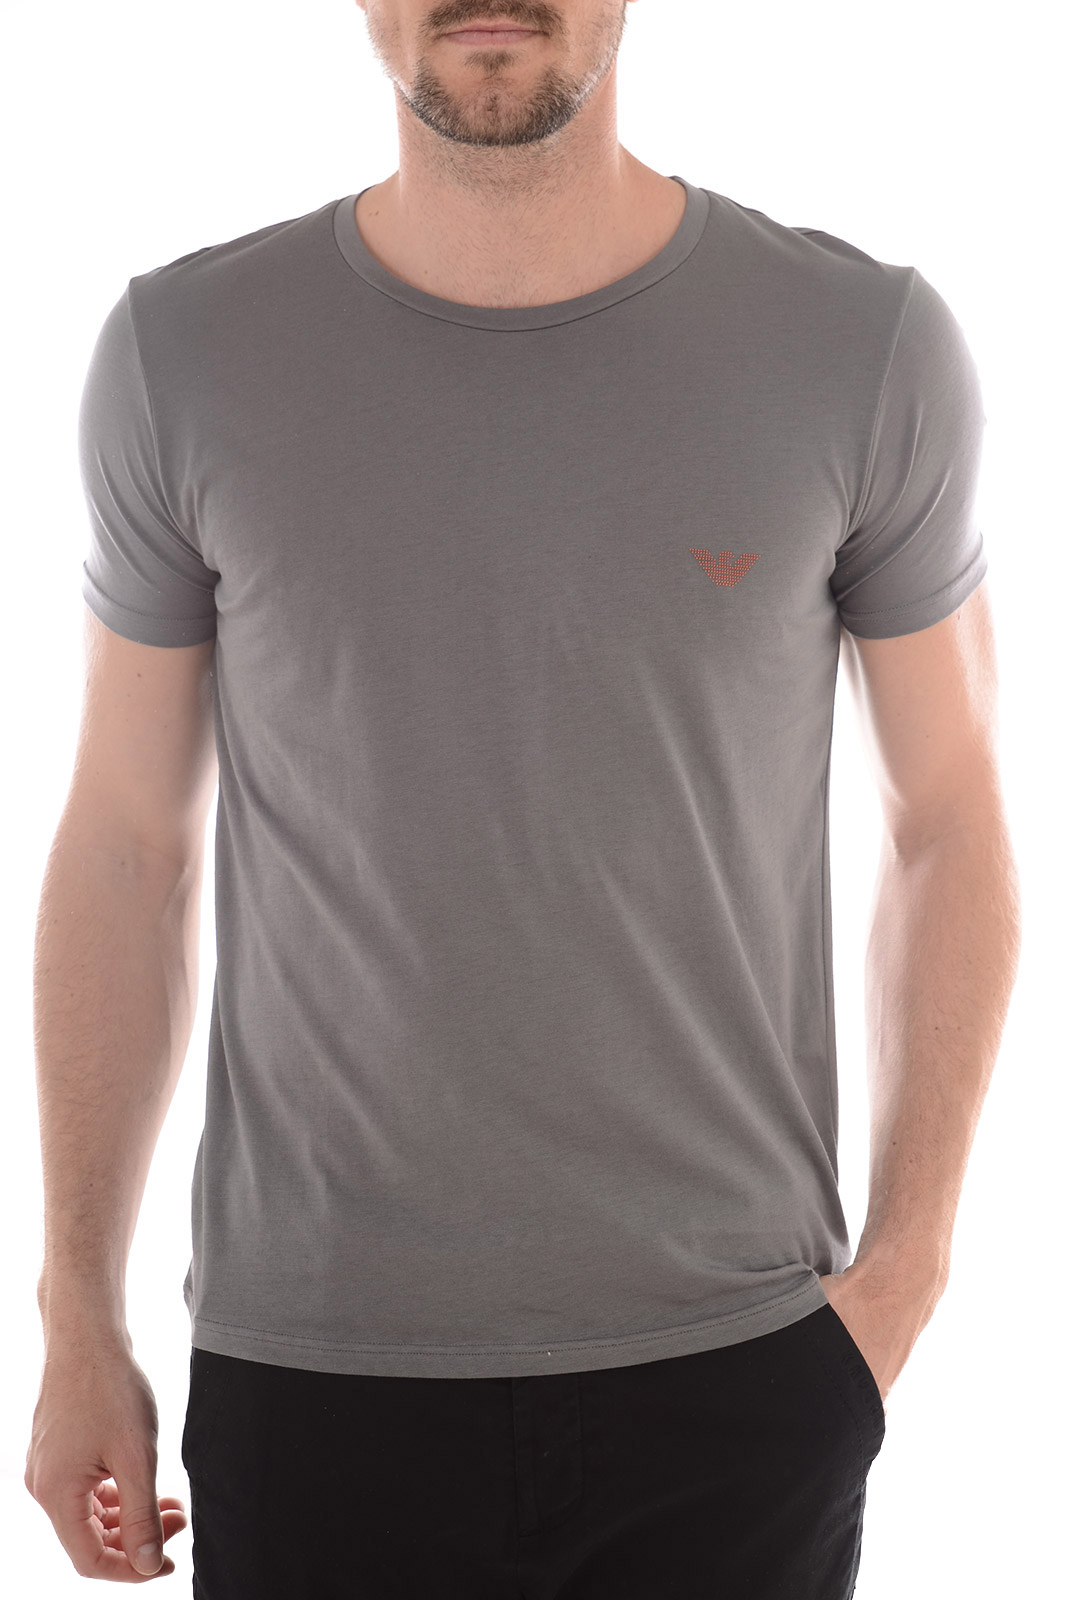 Tee-shirts  Emporio armani 211123 5P451 13343 GREIGE